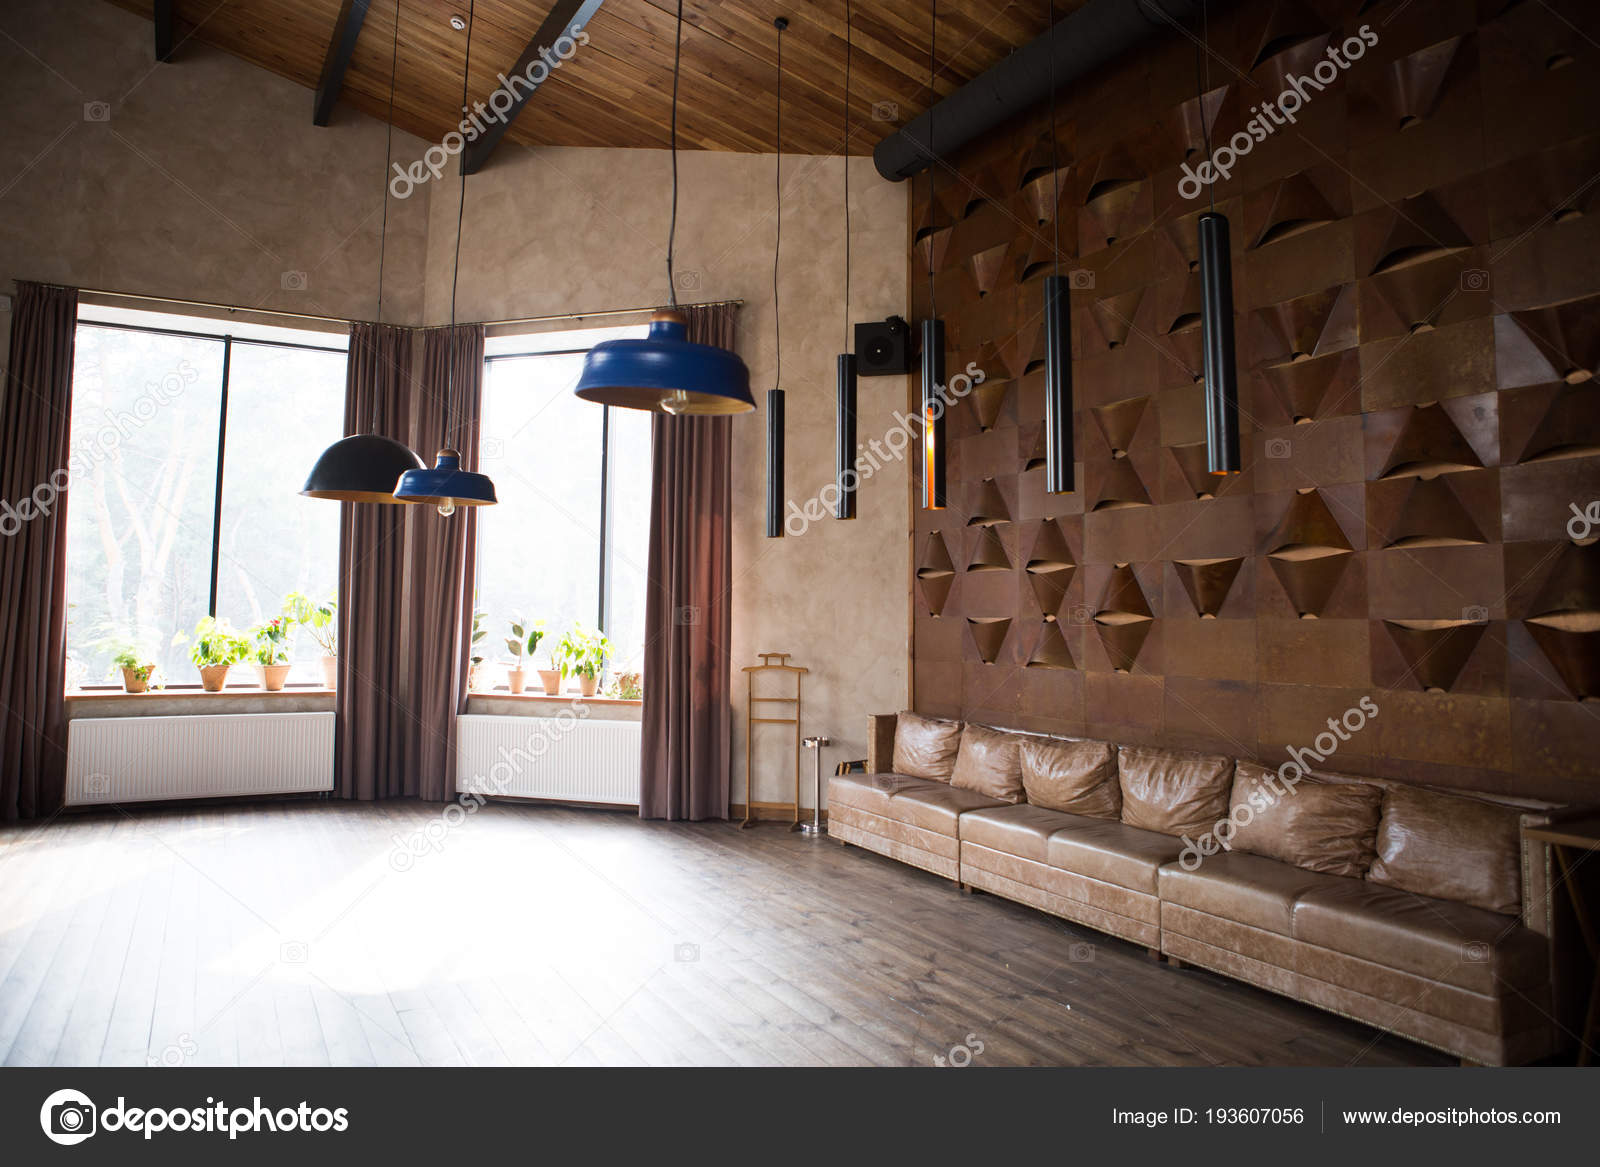 https://st3.depositphotos.com/16595328/19360/i/1600/depositphotos_193607056-stock-photo-interior-in-loft-style-high.jpg